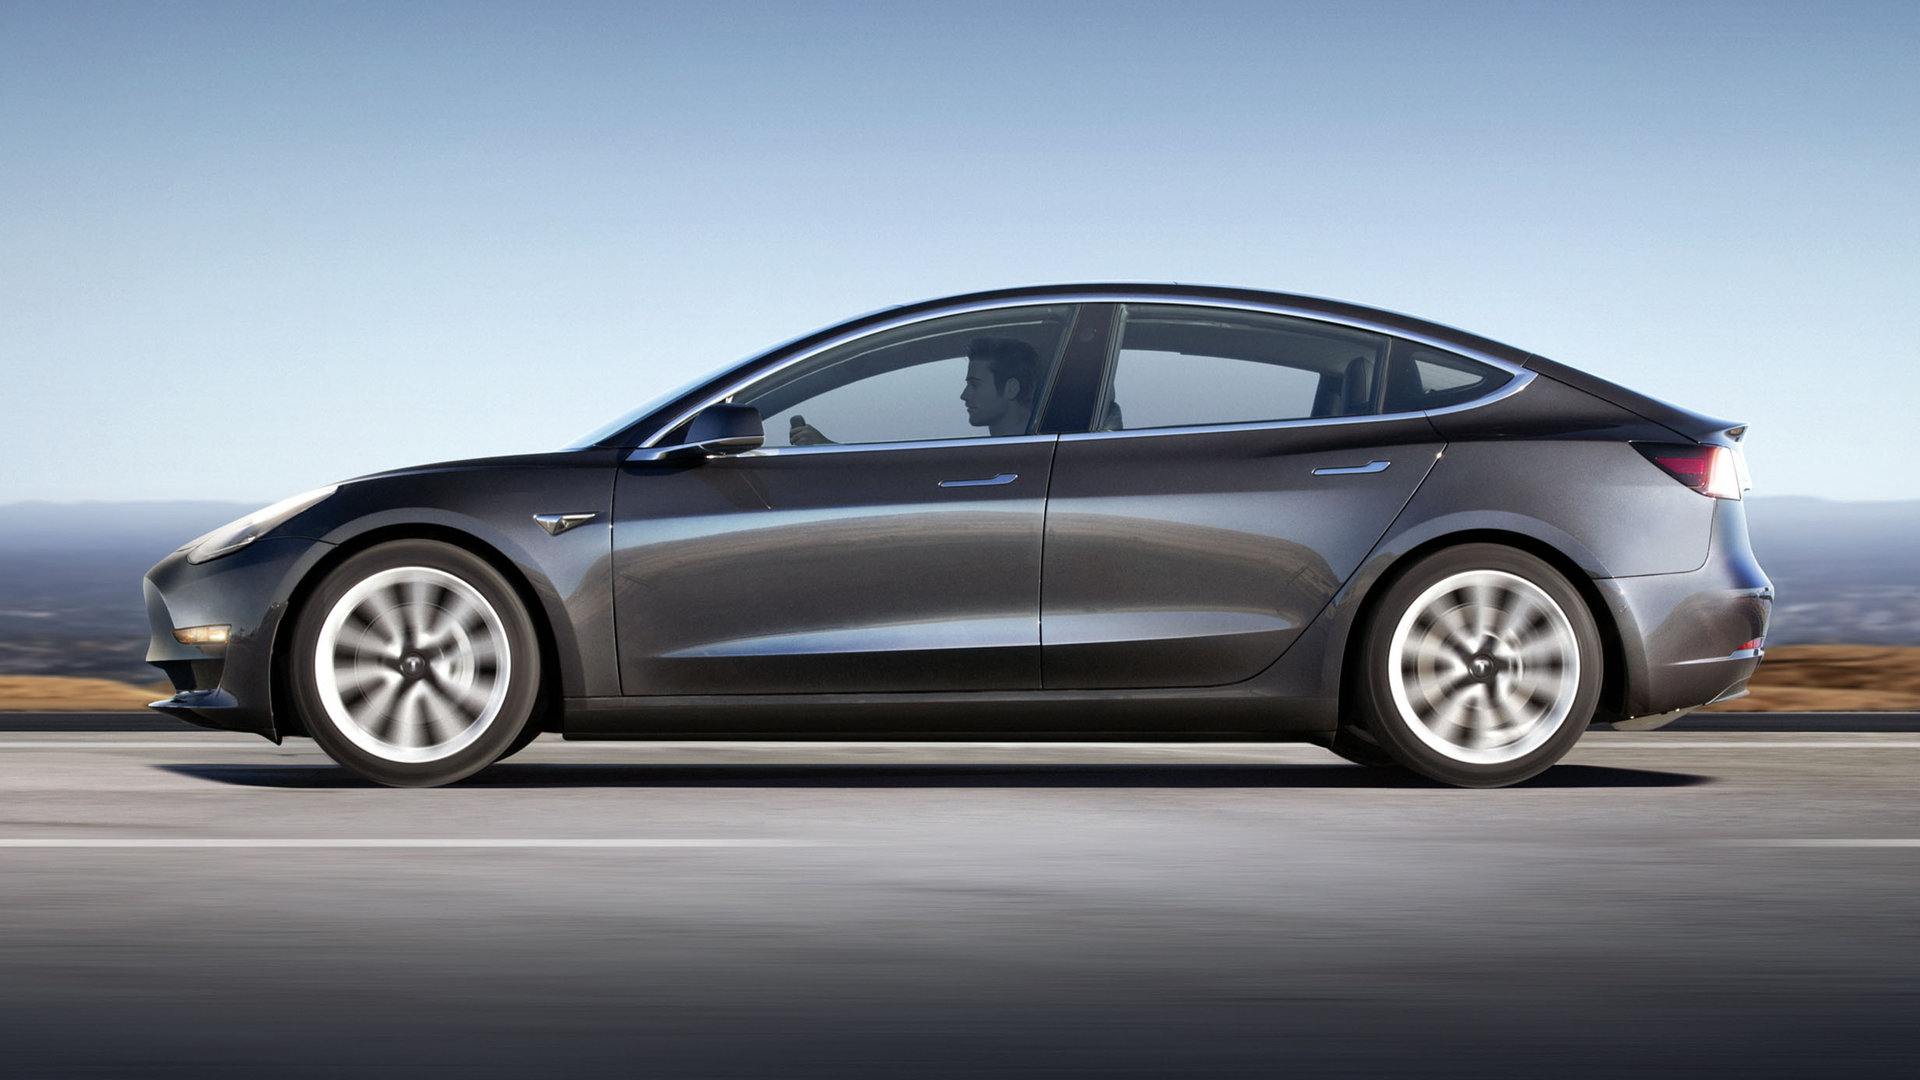 Top10 Adrian Tesla Model 3 Performance